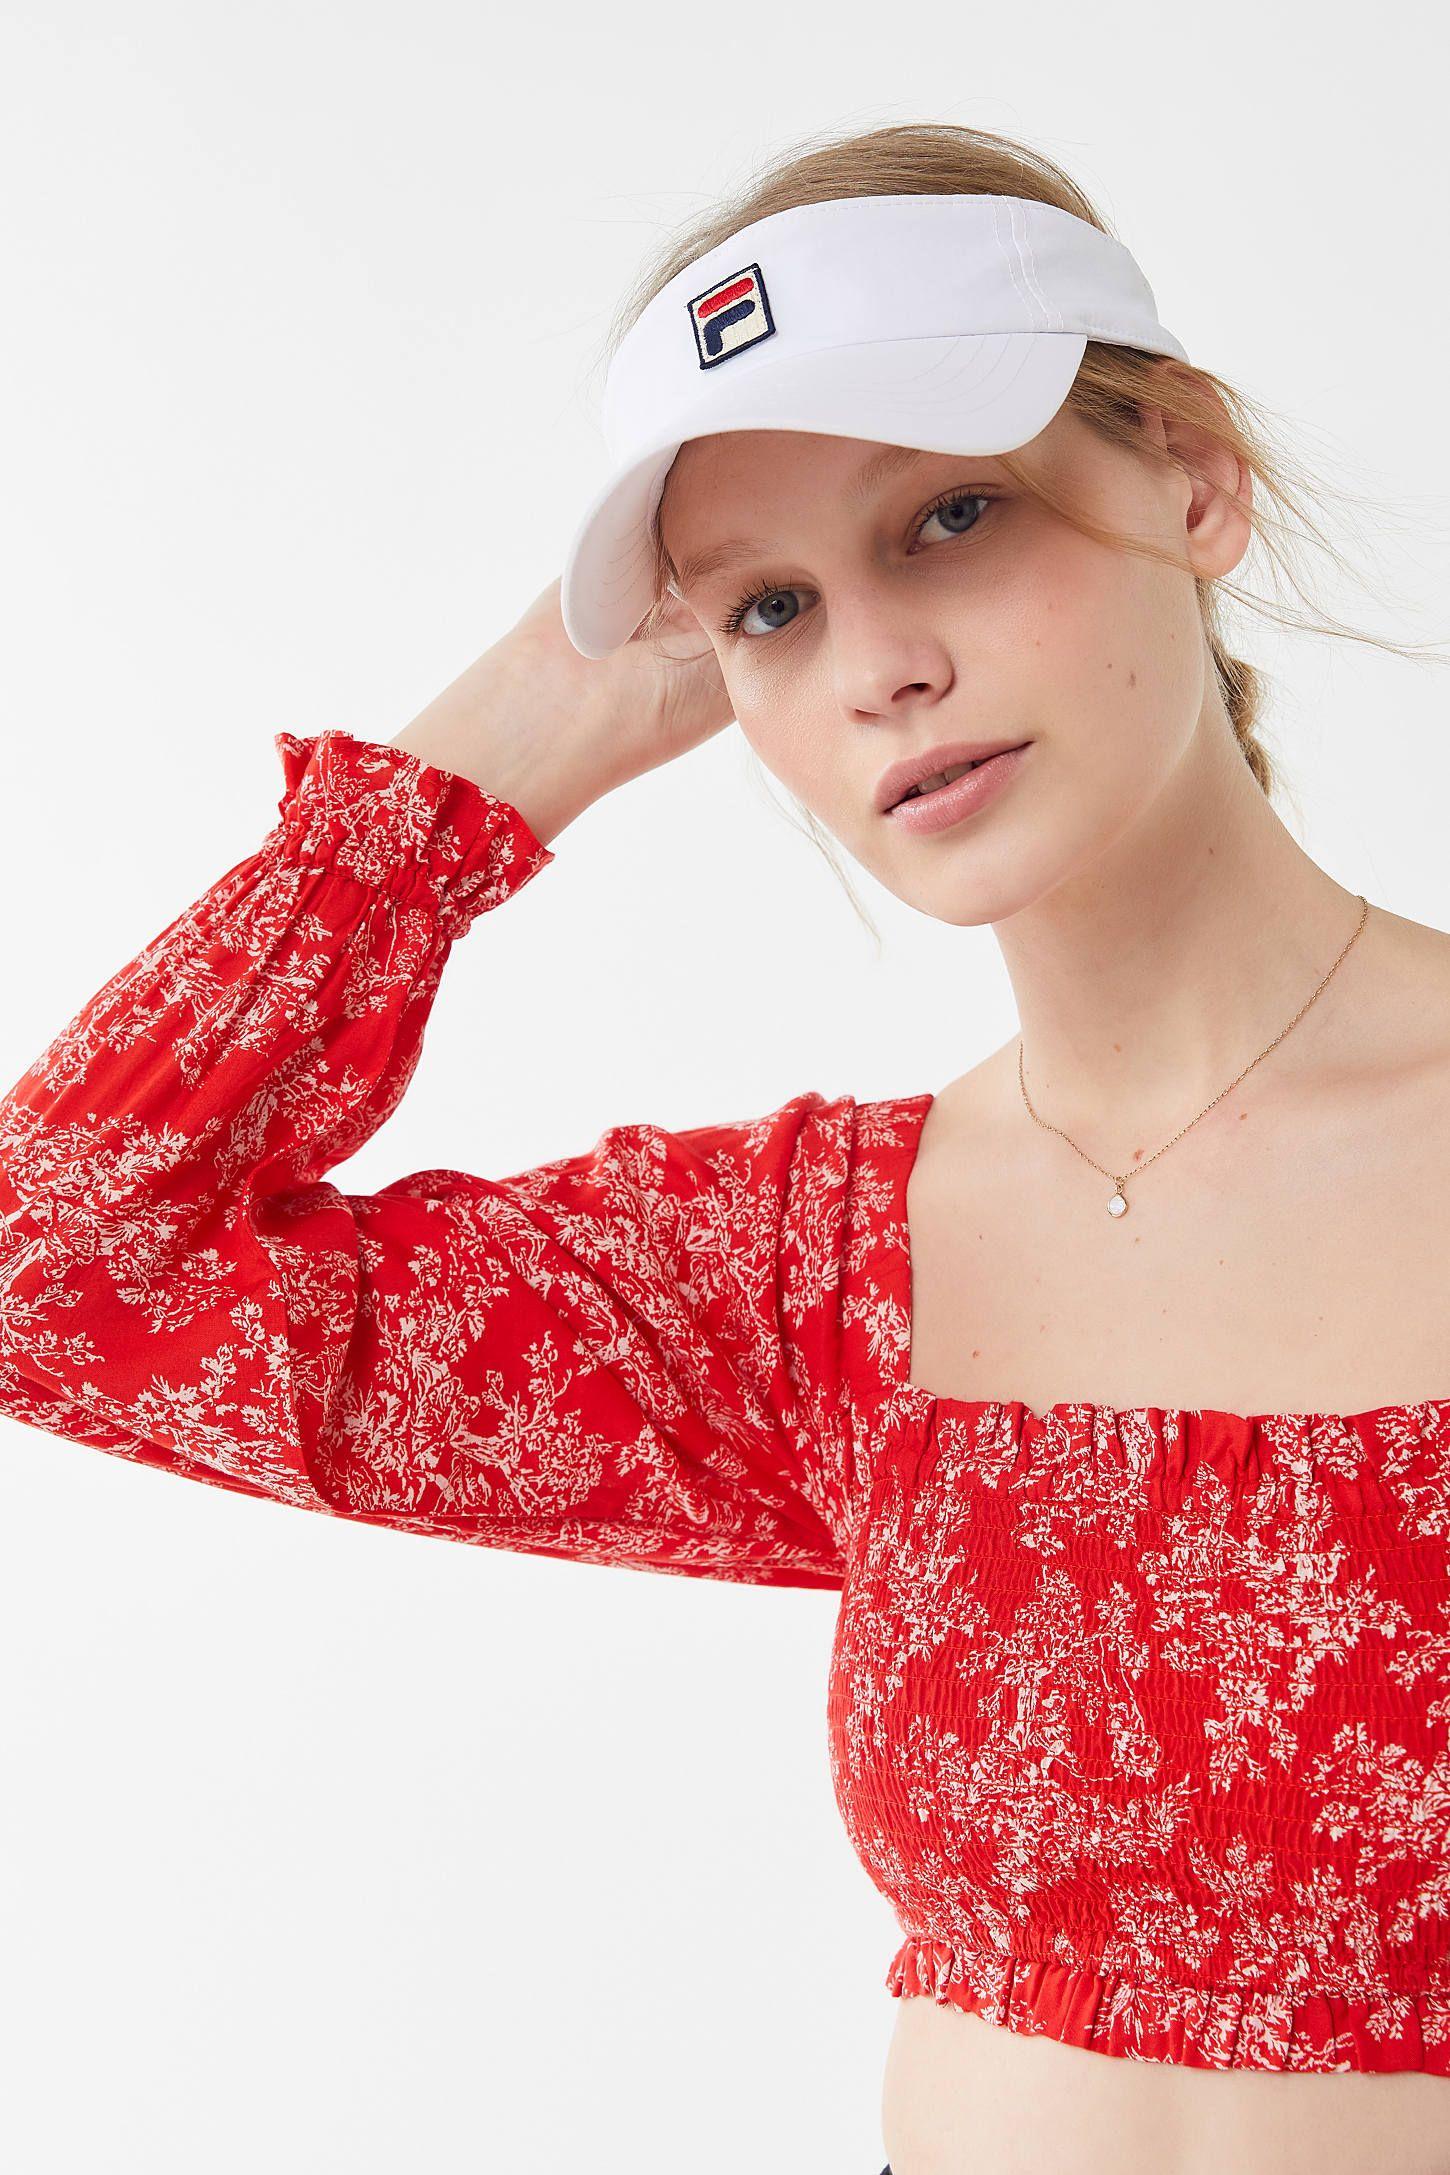 1aadd237d23 15 Best Summer Hats 2019 - Stylish Summer Hats for Women